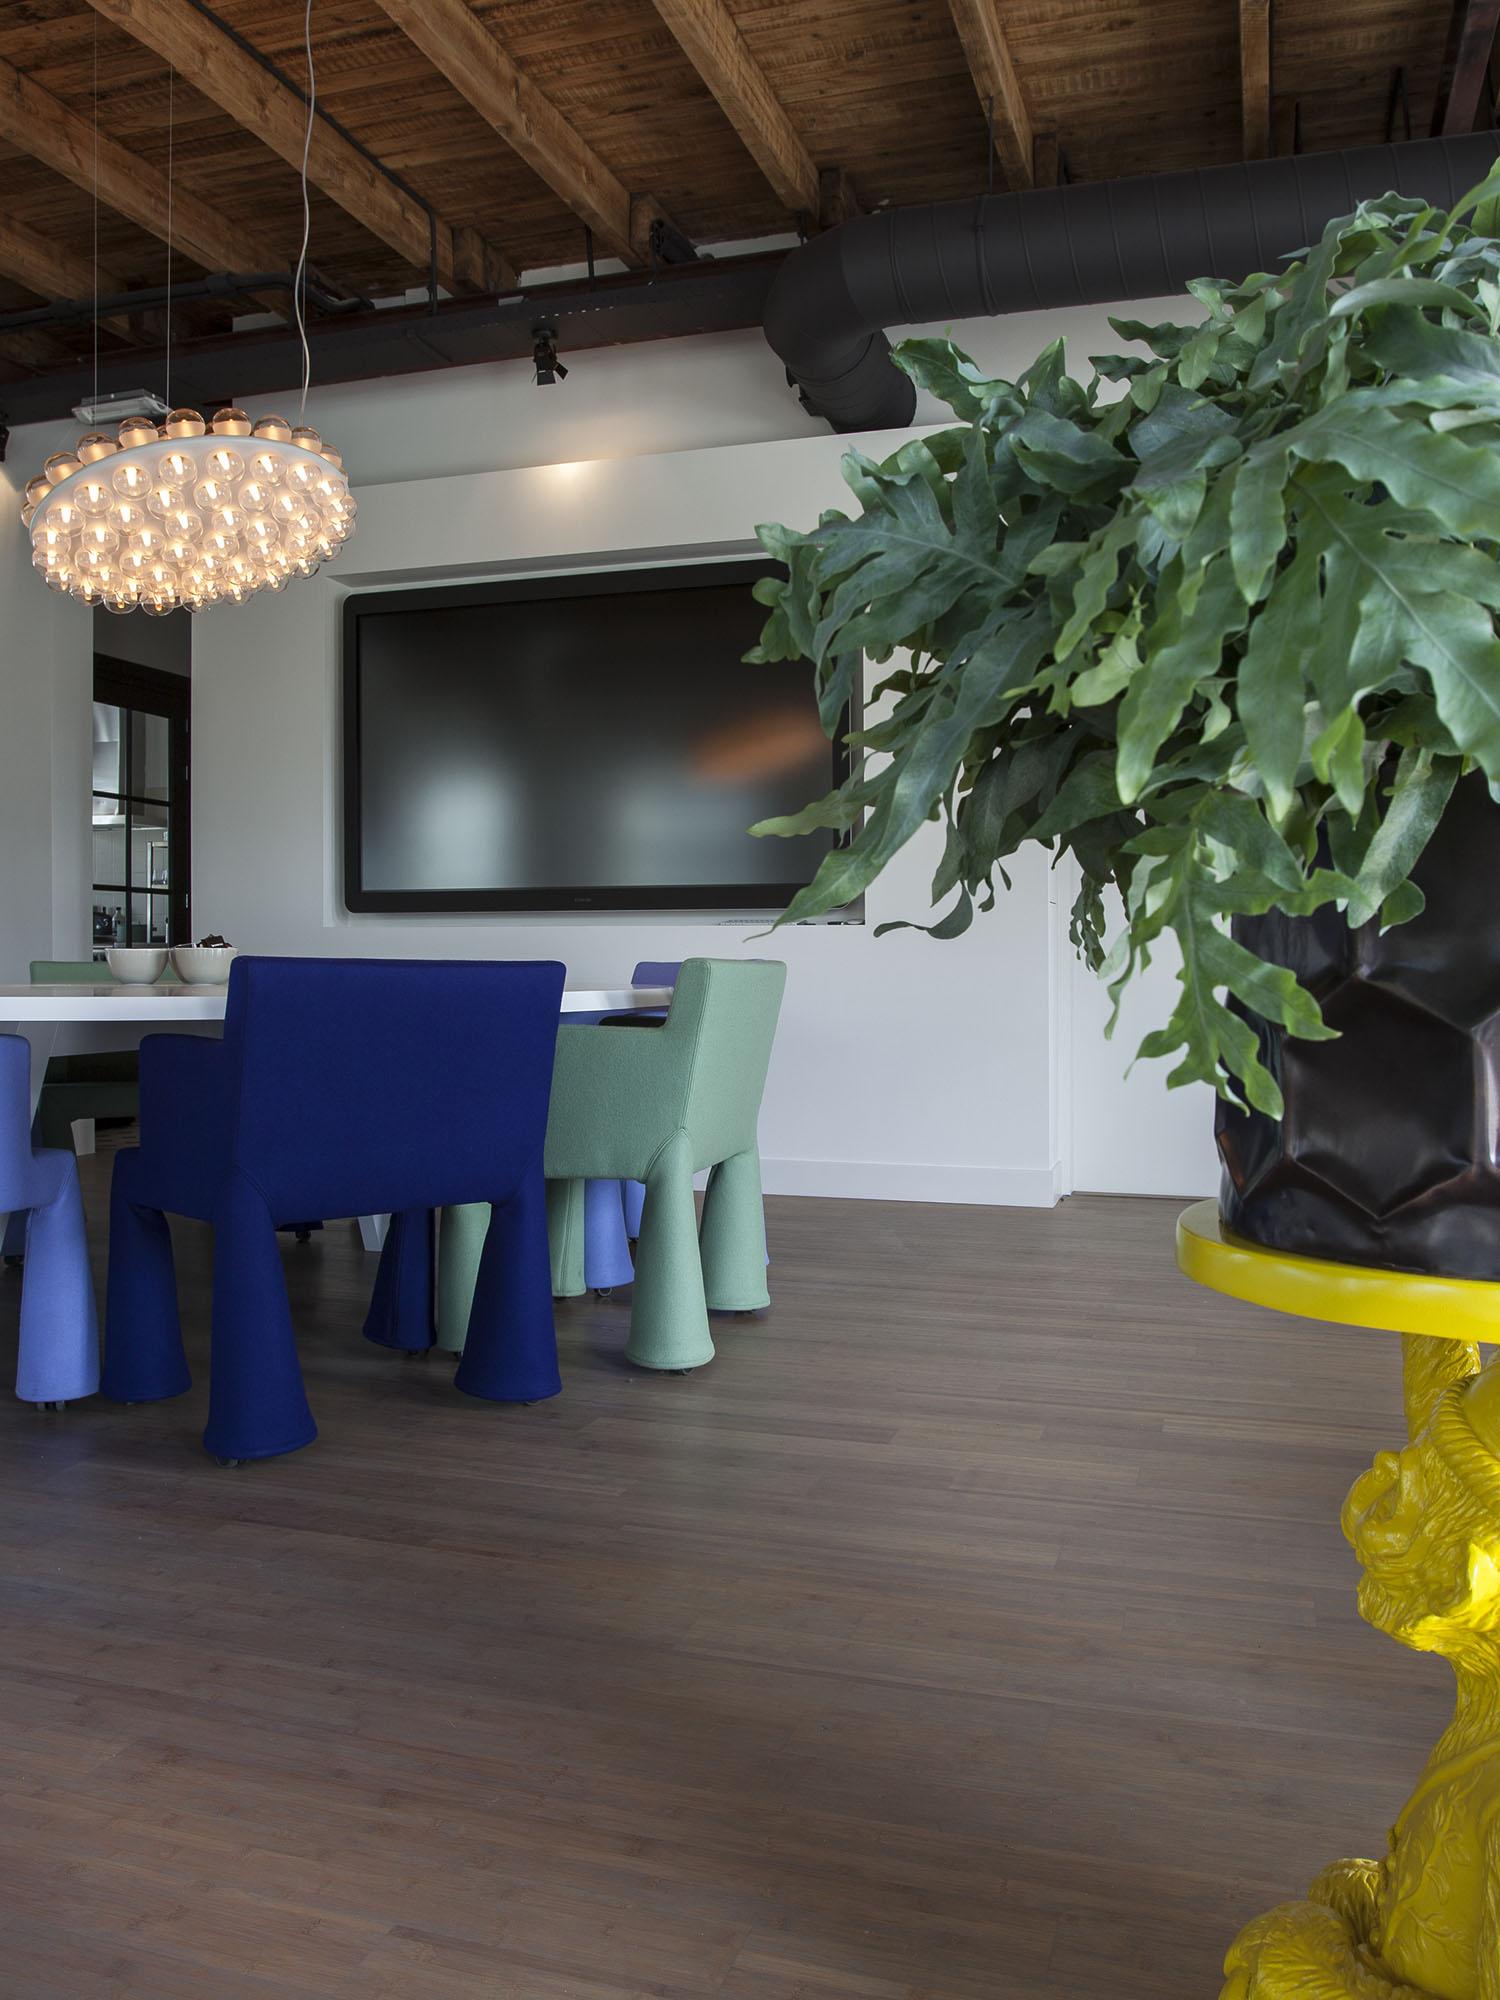 studio-hermanides-loft-office-14.jpg